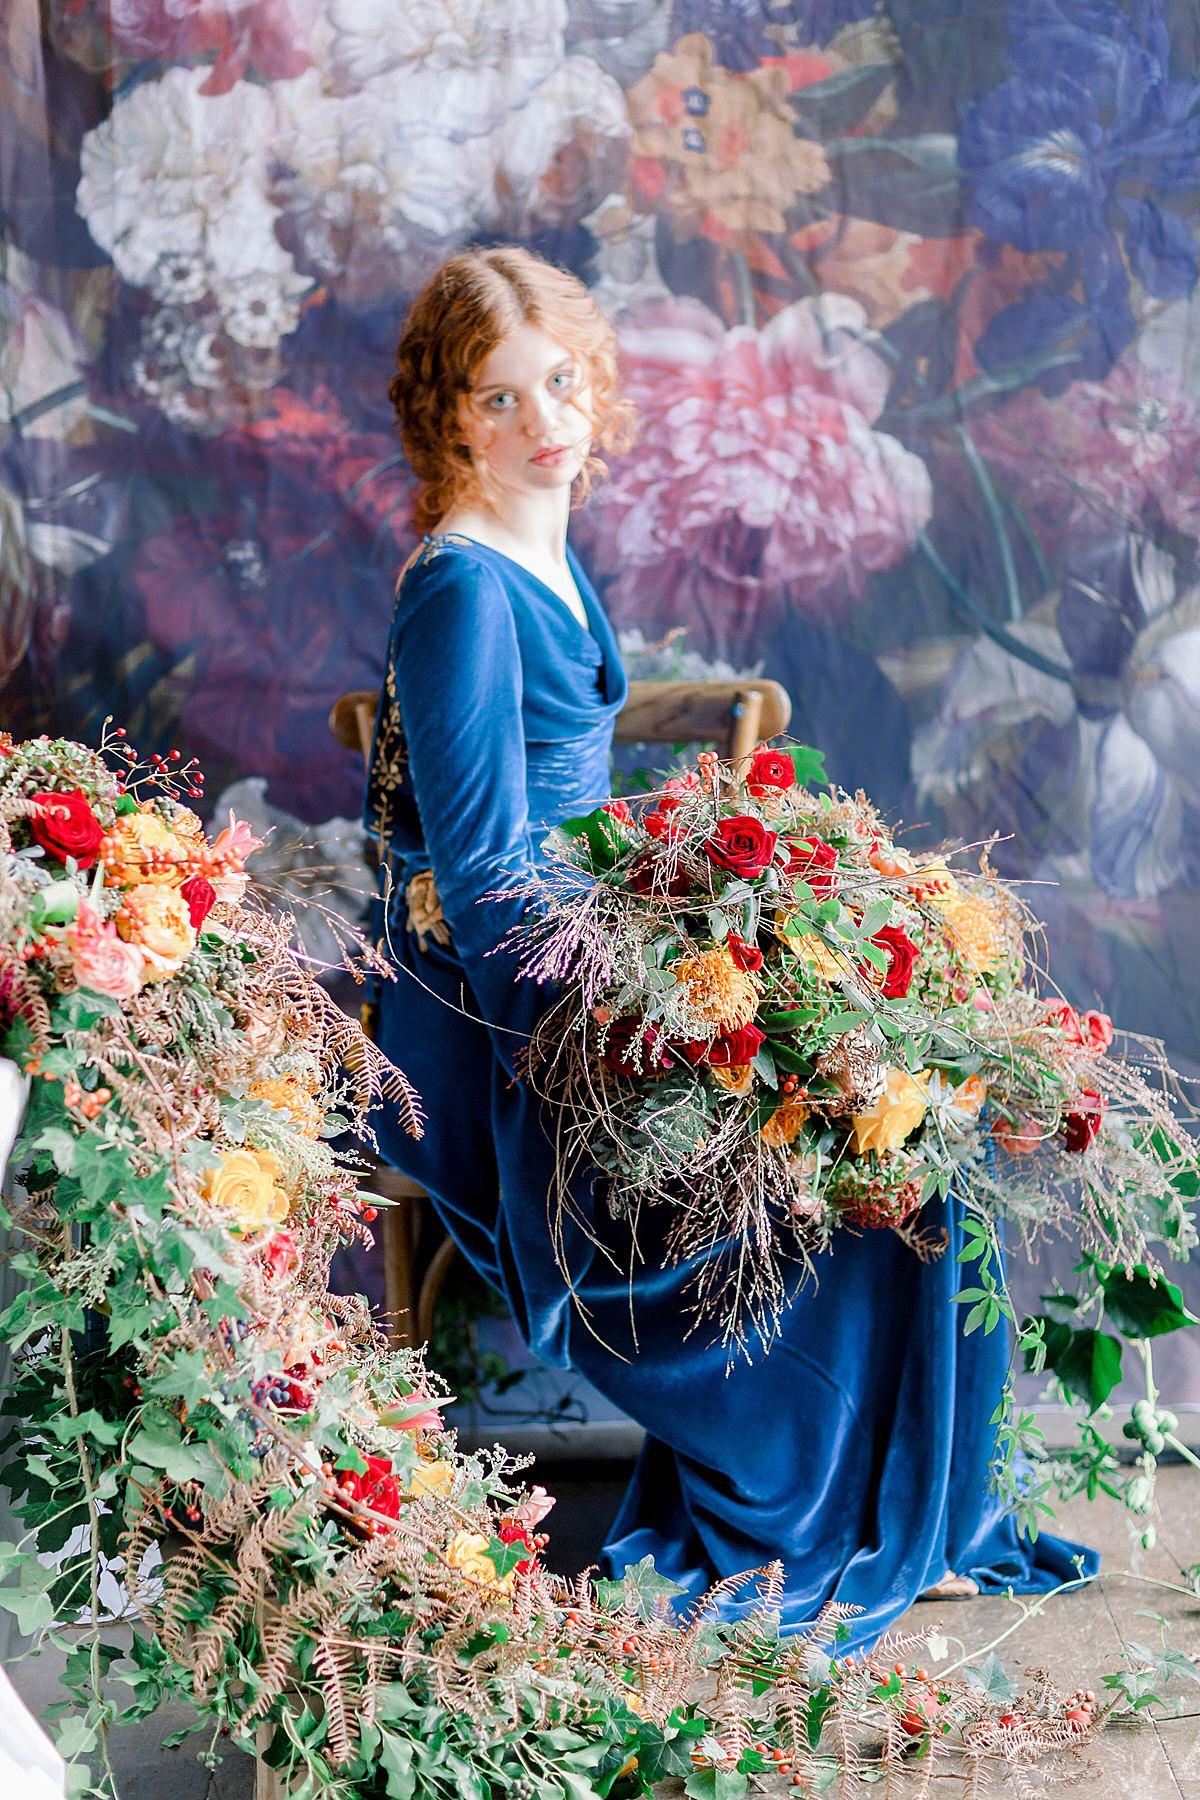 Briar-Rose-Blue-Velvet-Interior-JFD-JoBradbury (4).jpg